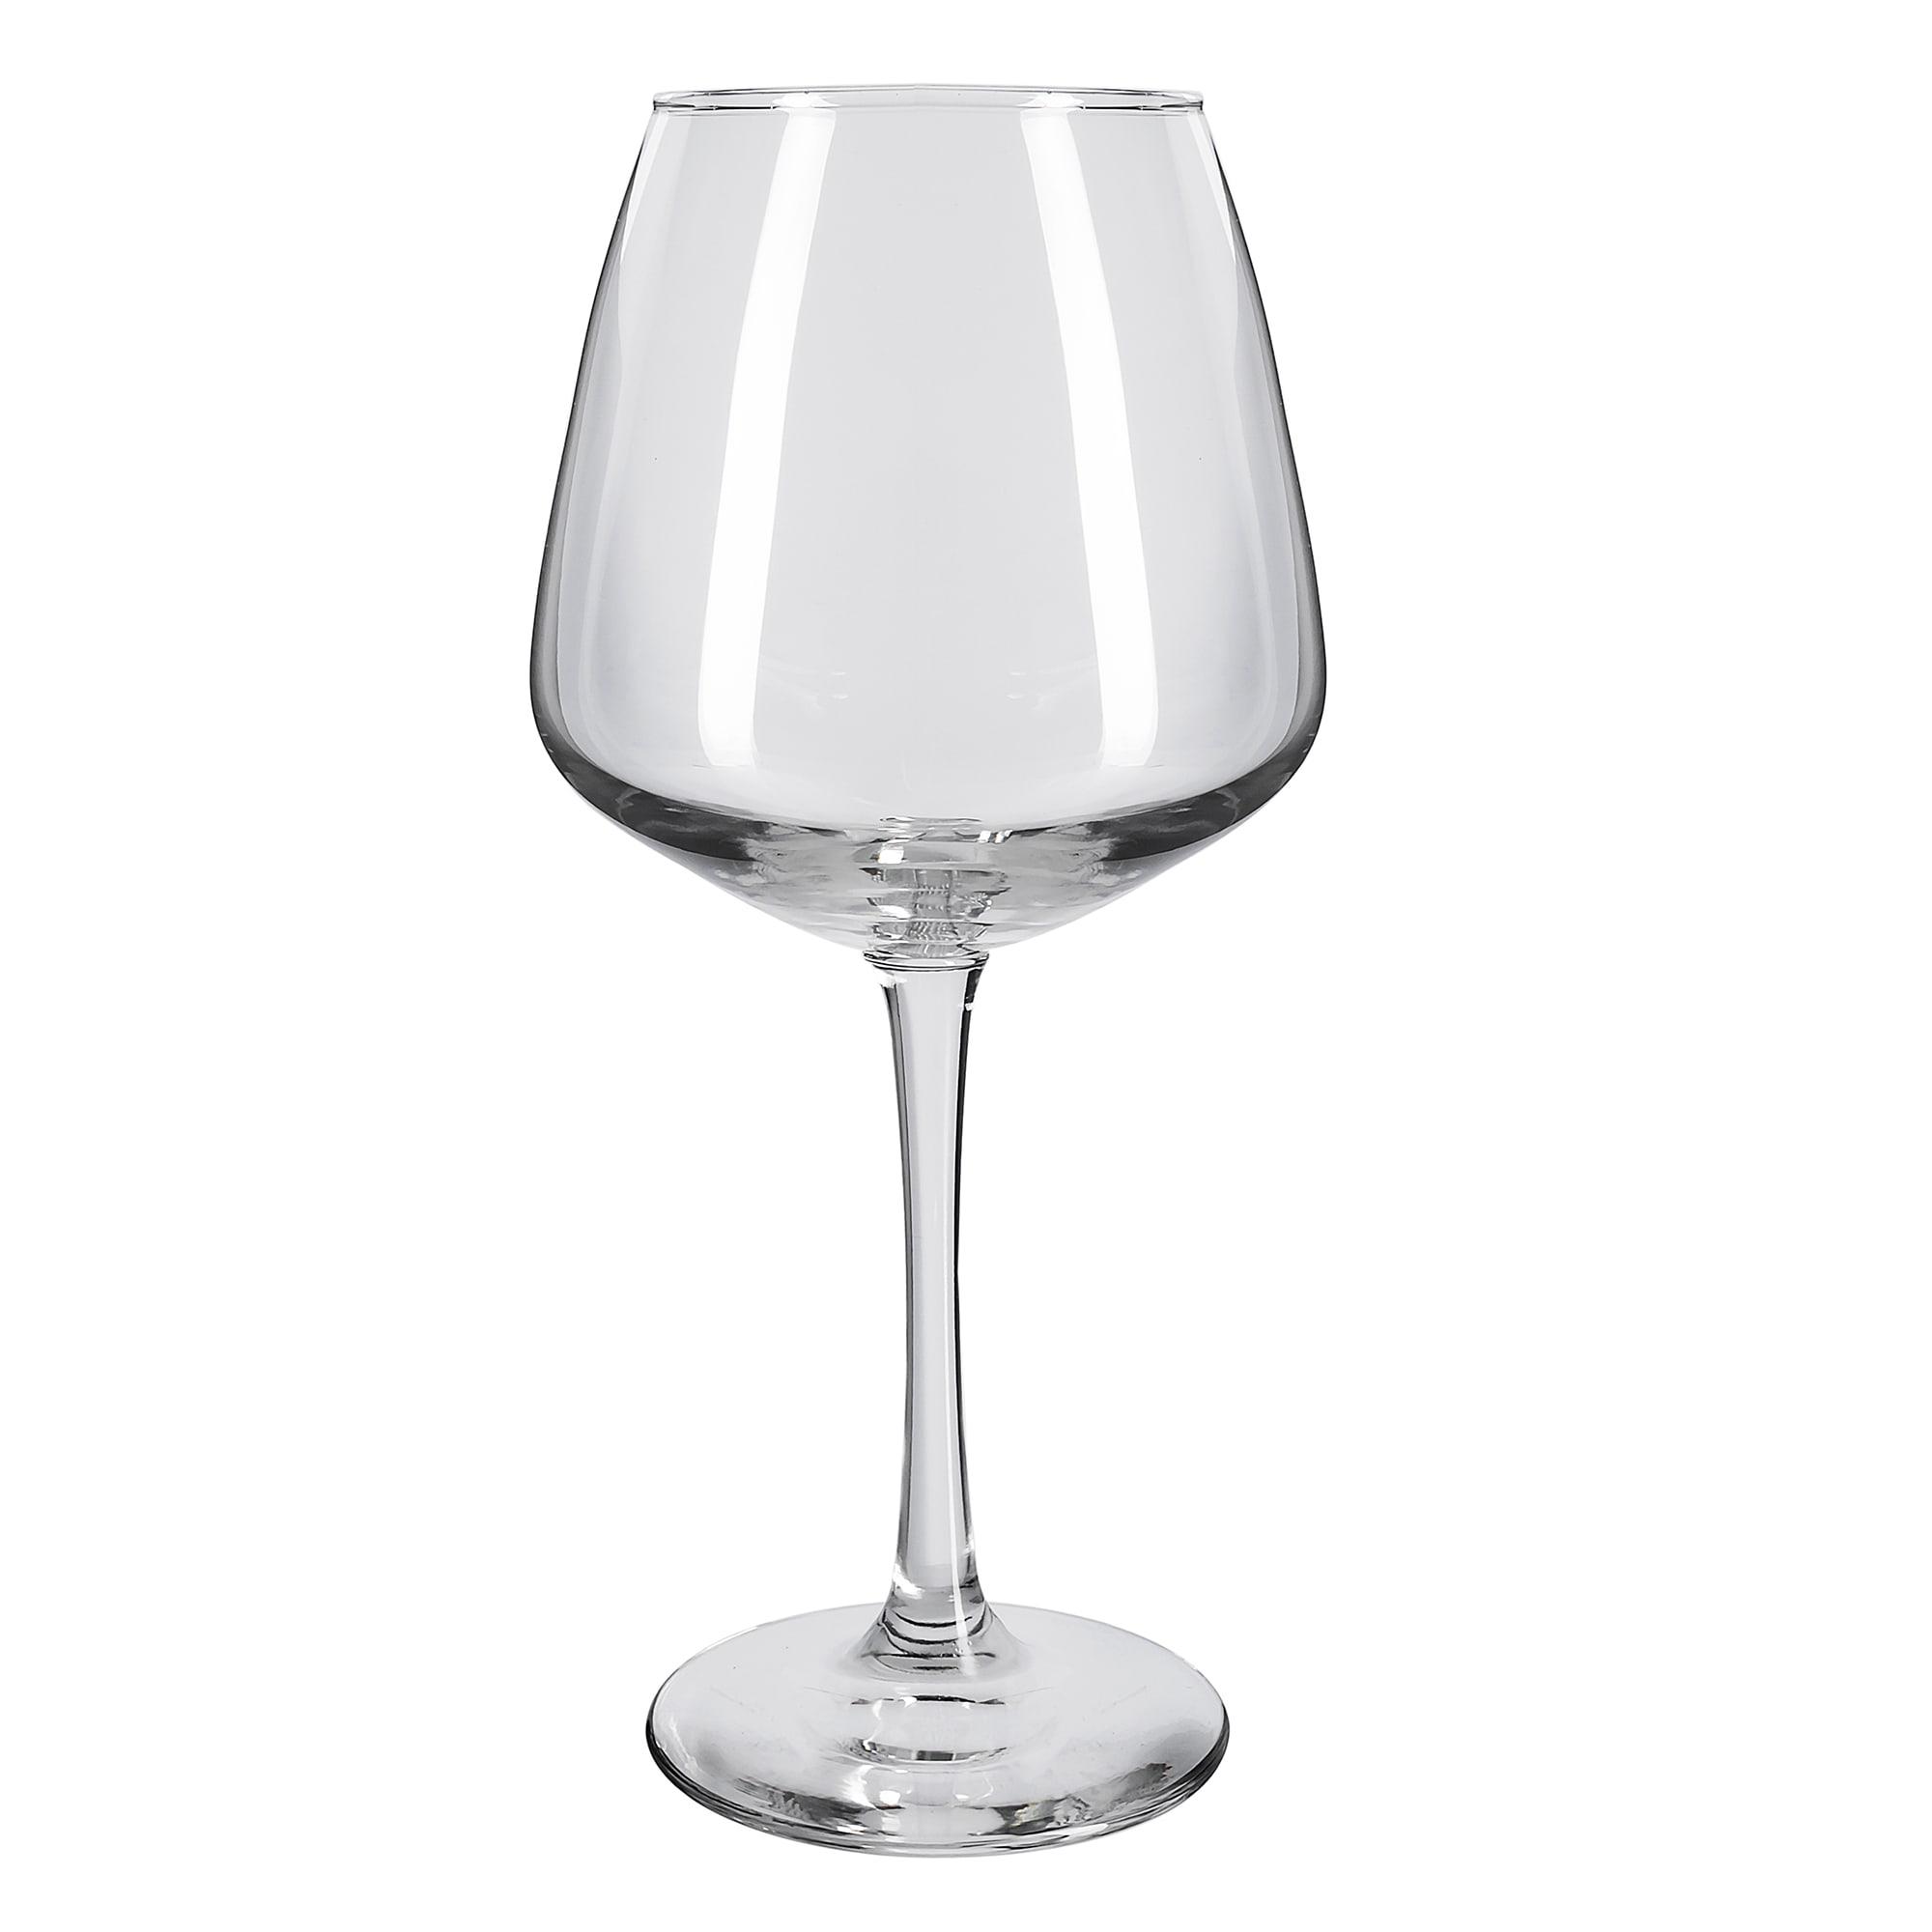 Libbey 7515 18.25-oz Vina Diamond Balloon Wine Glass